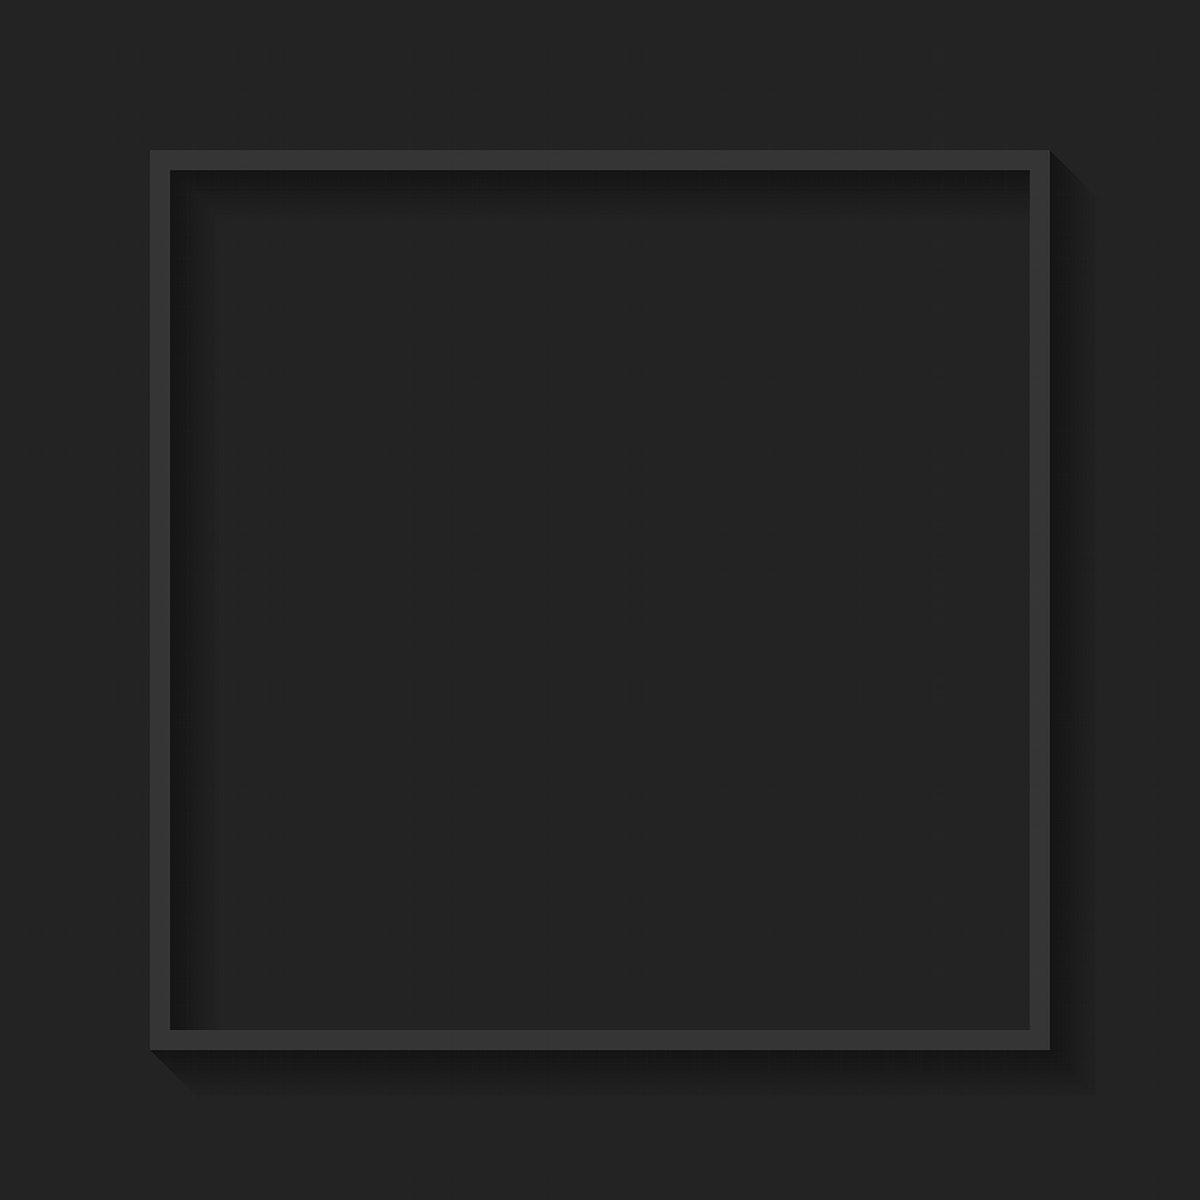 Square gray frame on black background vector